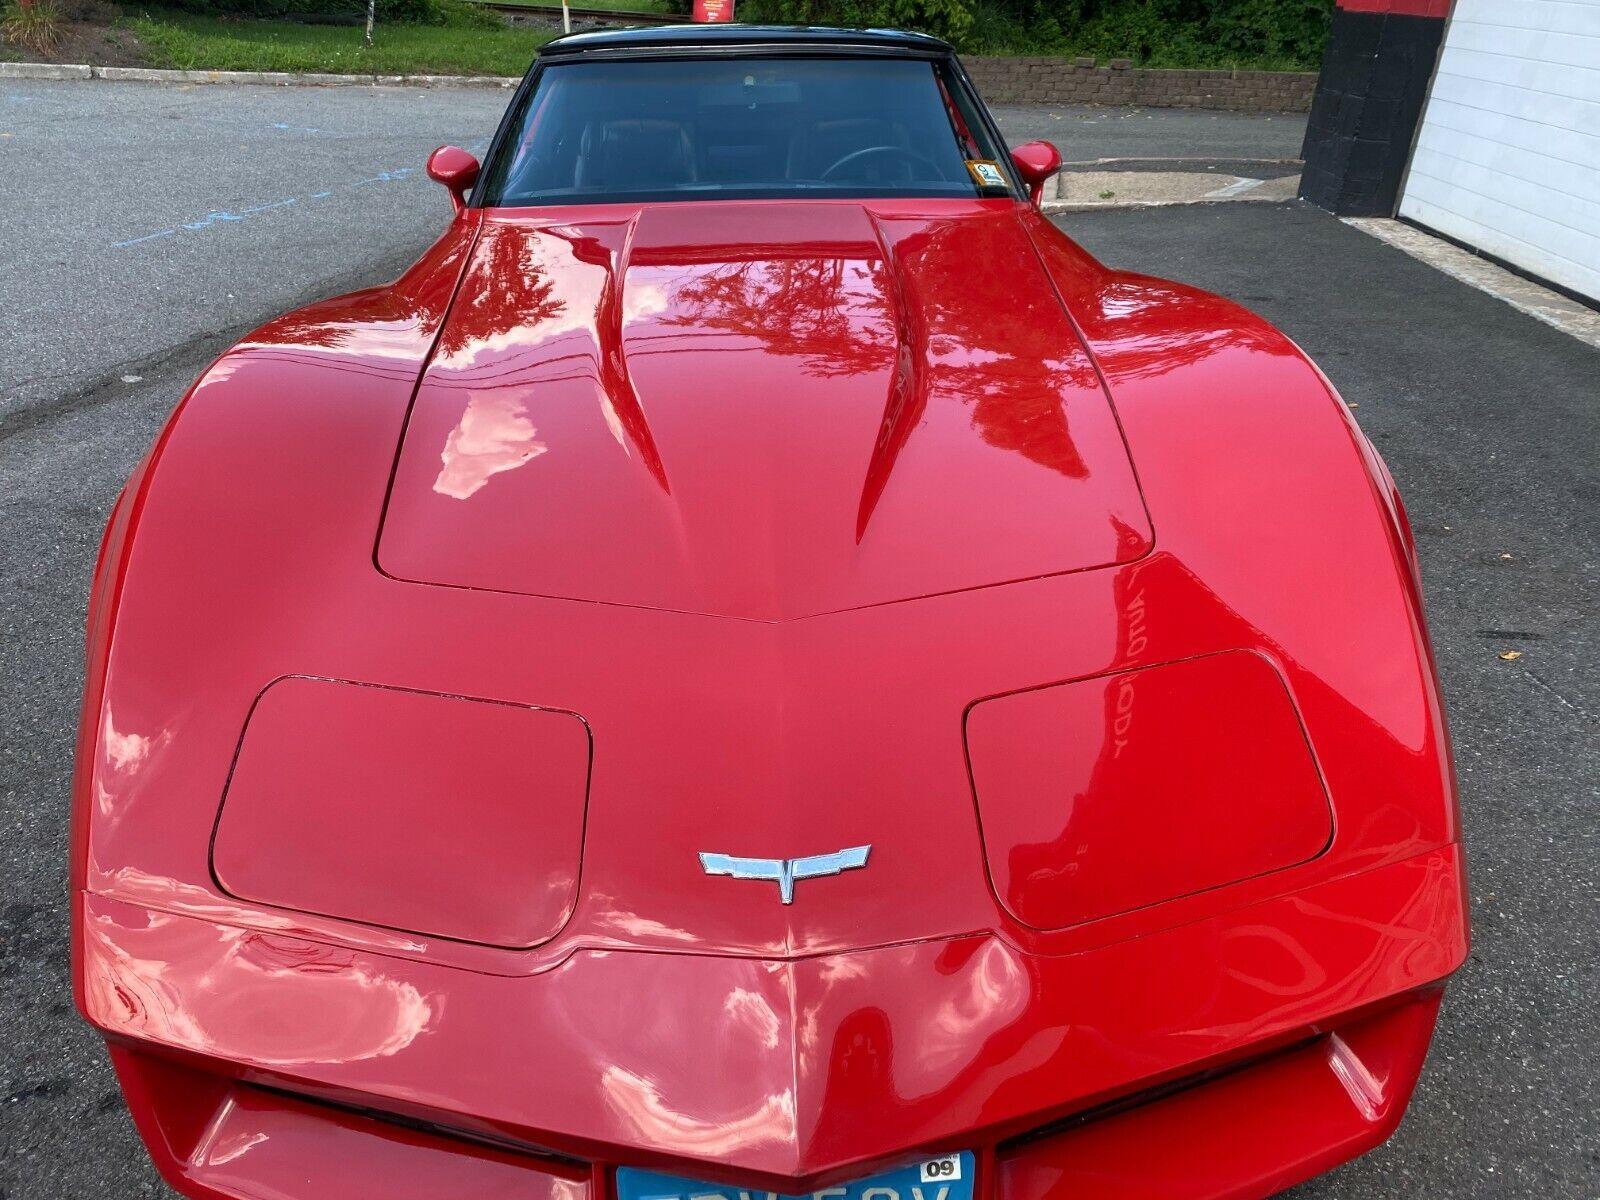 1980 Red Chevrolet Corvette     C3 Corvette Photo 1